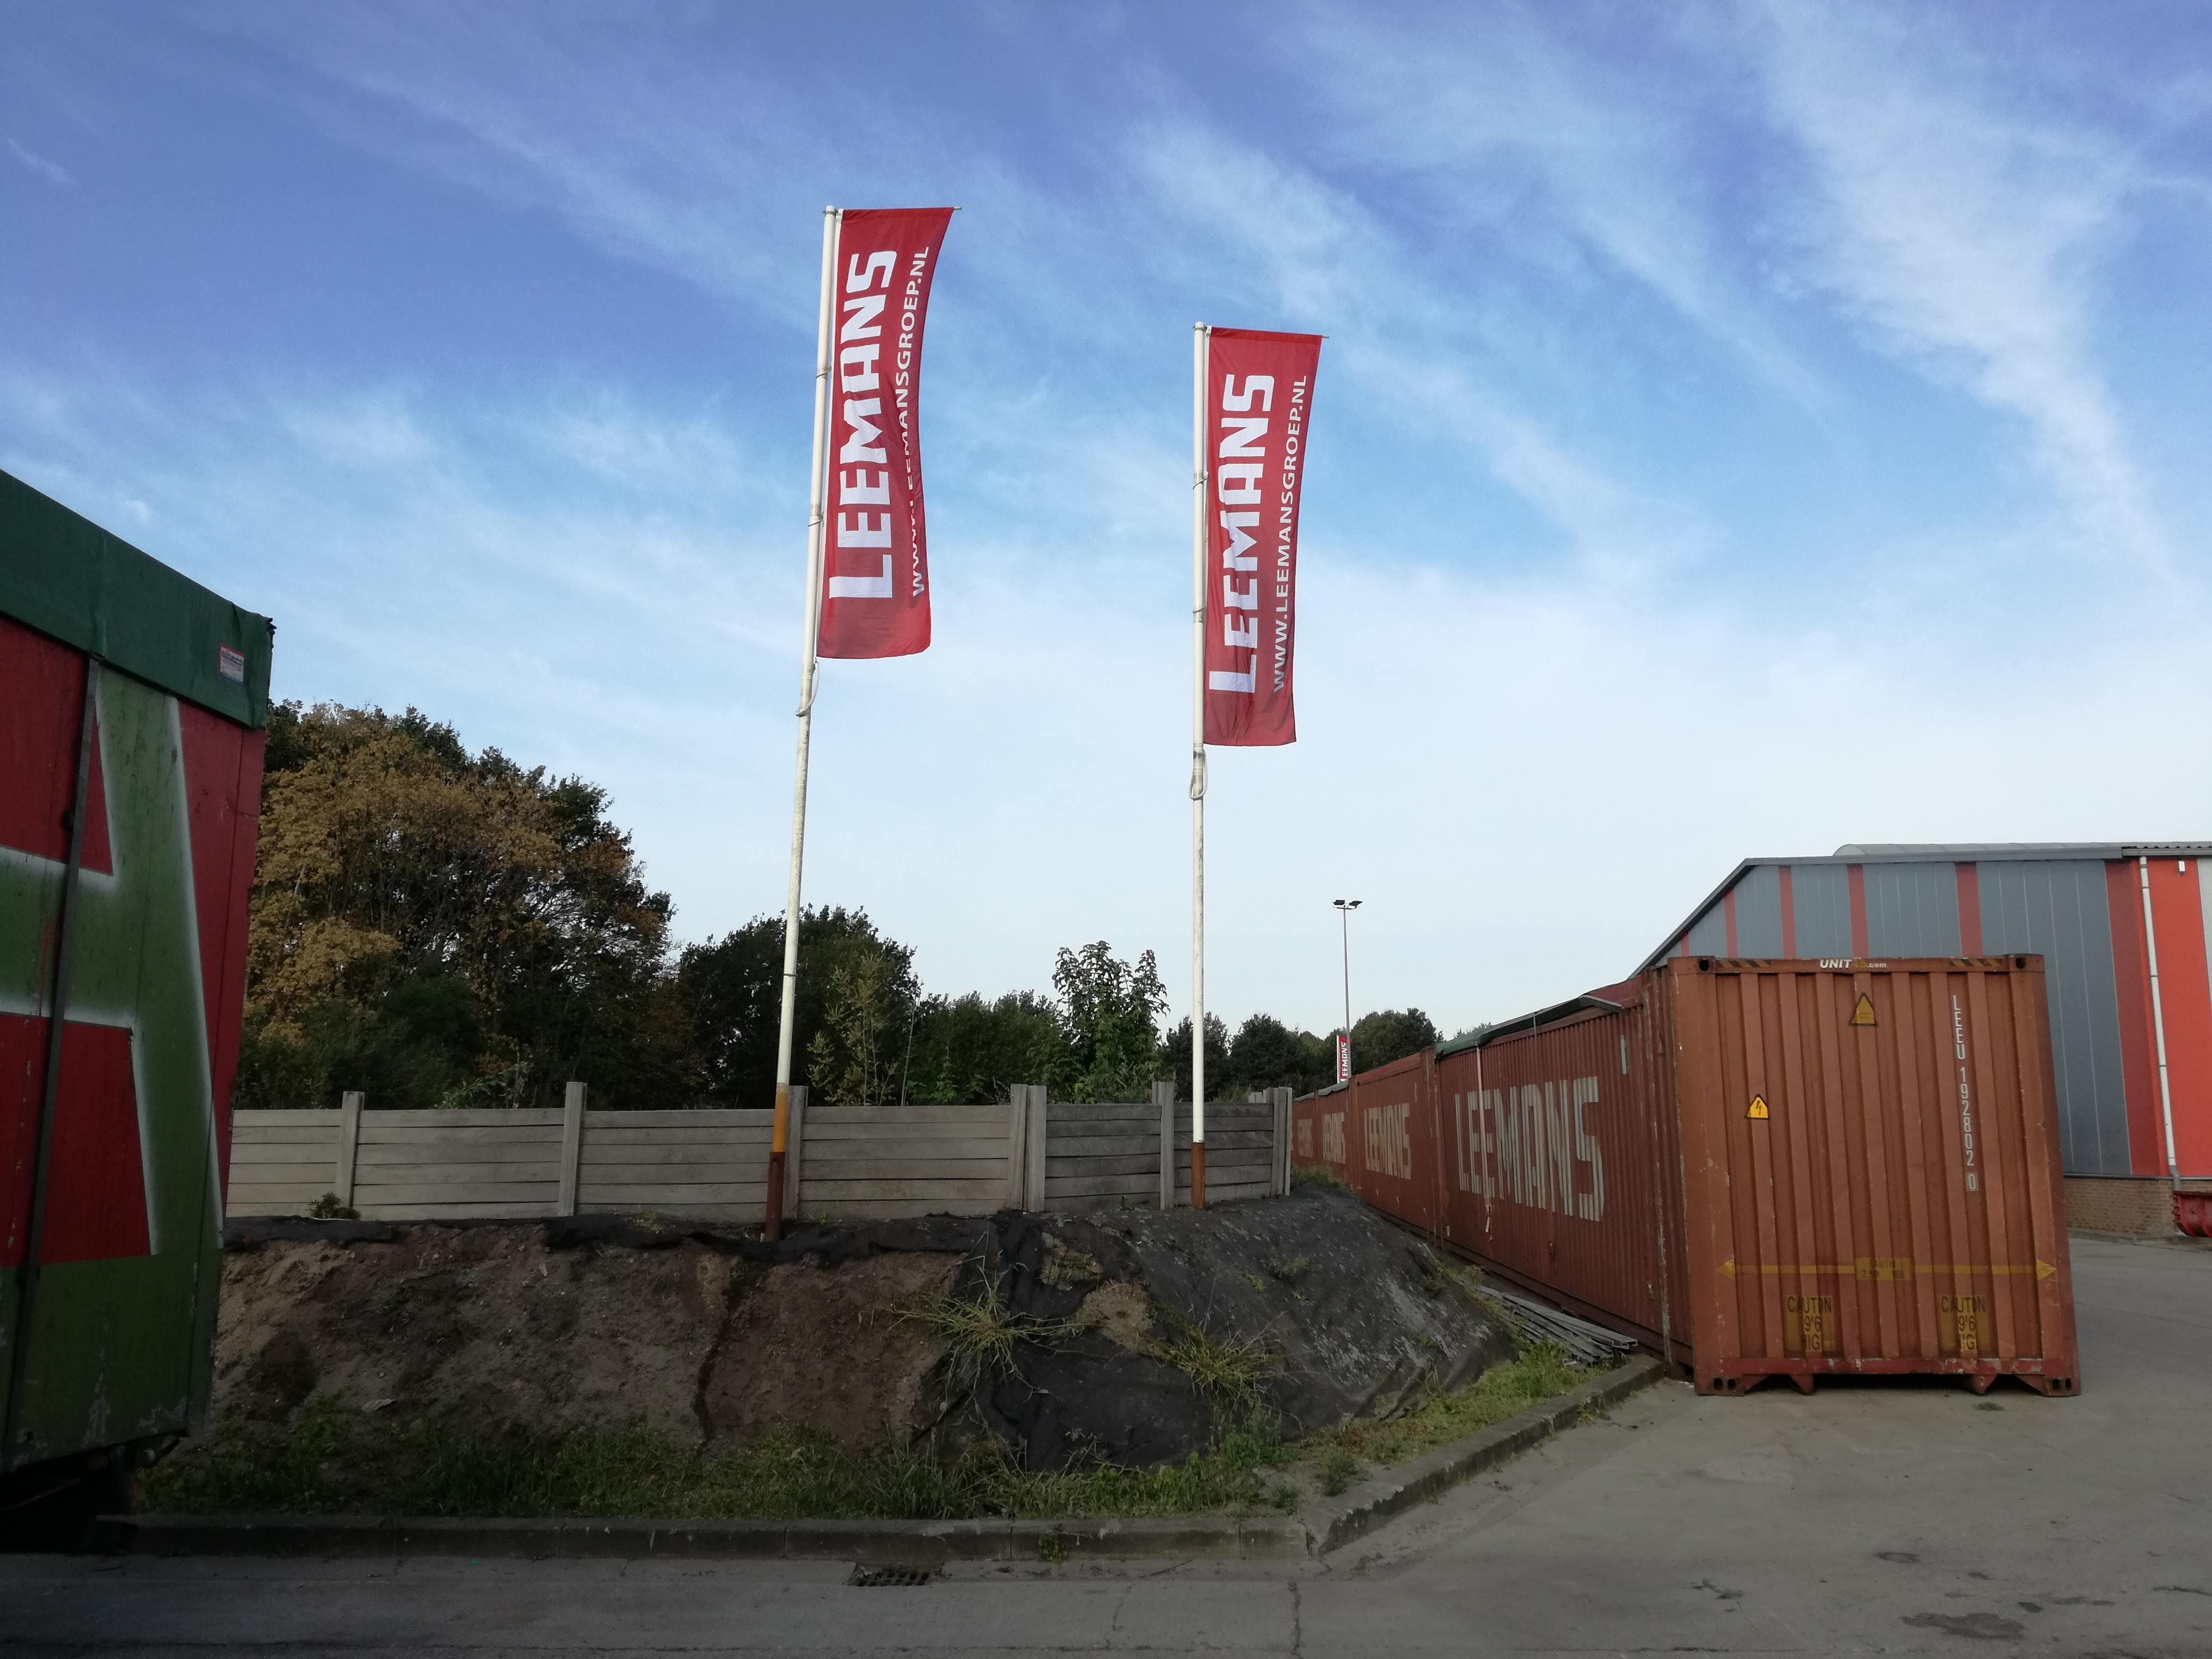 vlag, baniervlag, baniervlaggen, mast, Leemans, Vriezenveen, Almelo, AS Paint